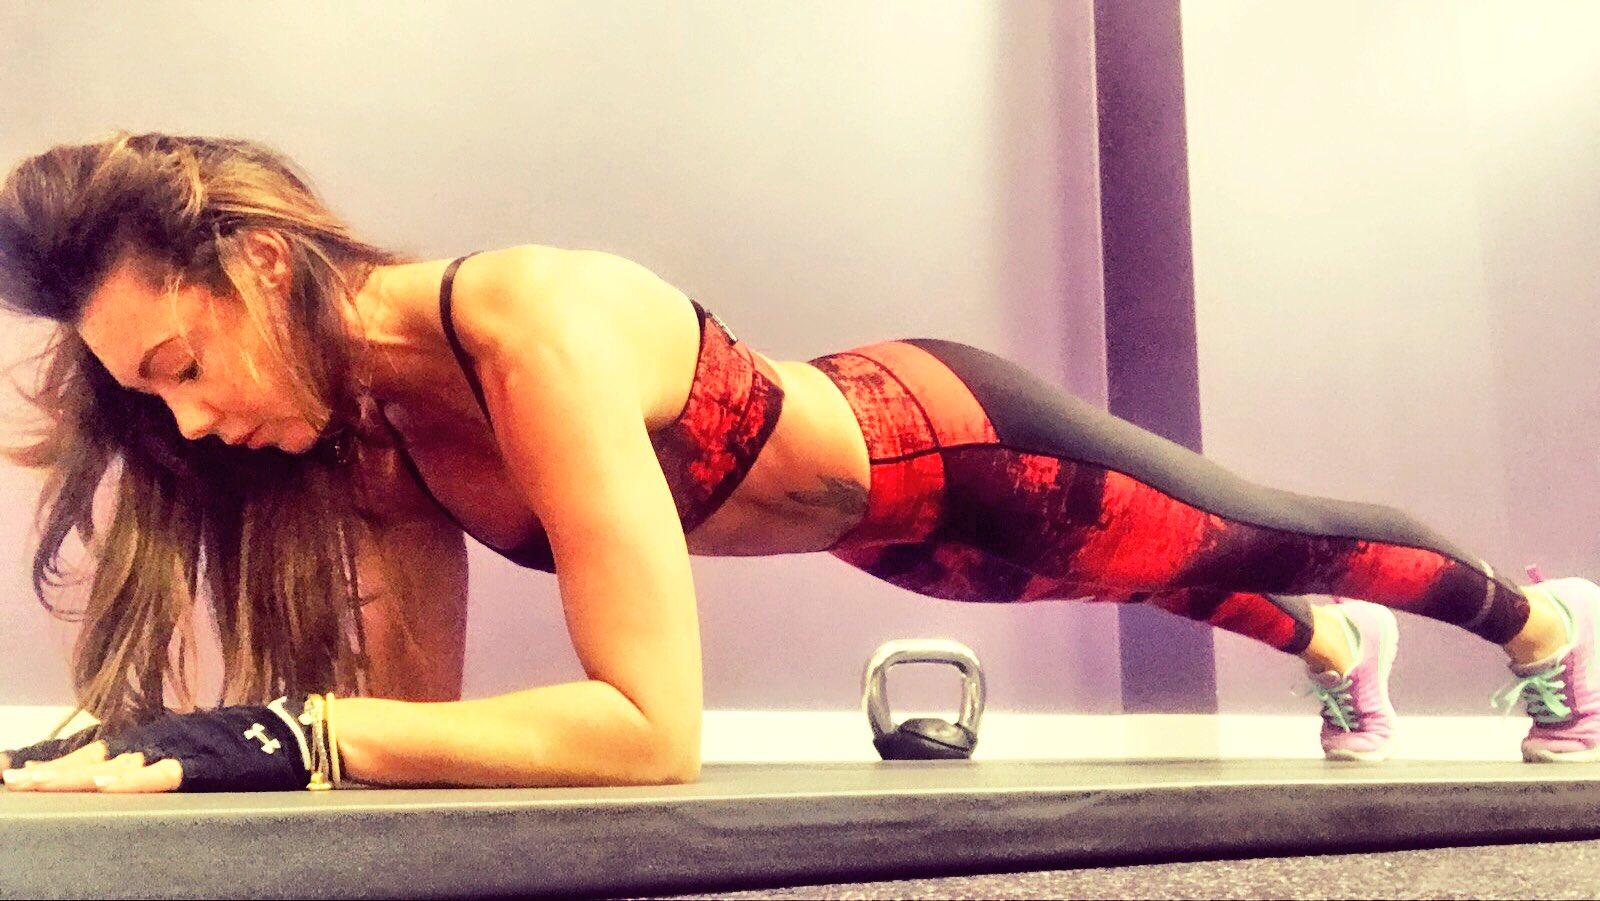 #planking #plank #workout #workoutmotivation @AnytimeFitUK https://t.co/eukJbznLu0